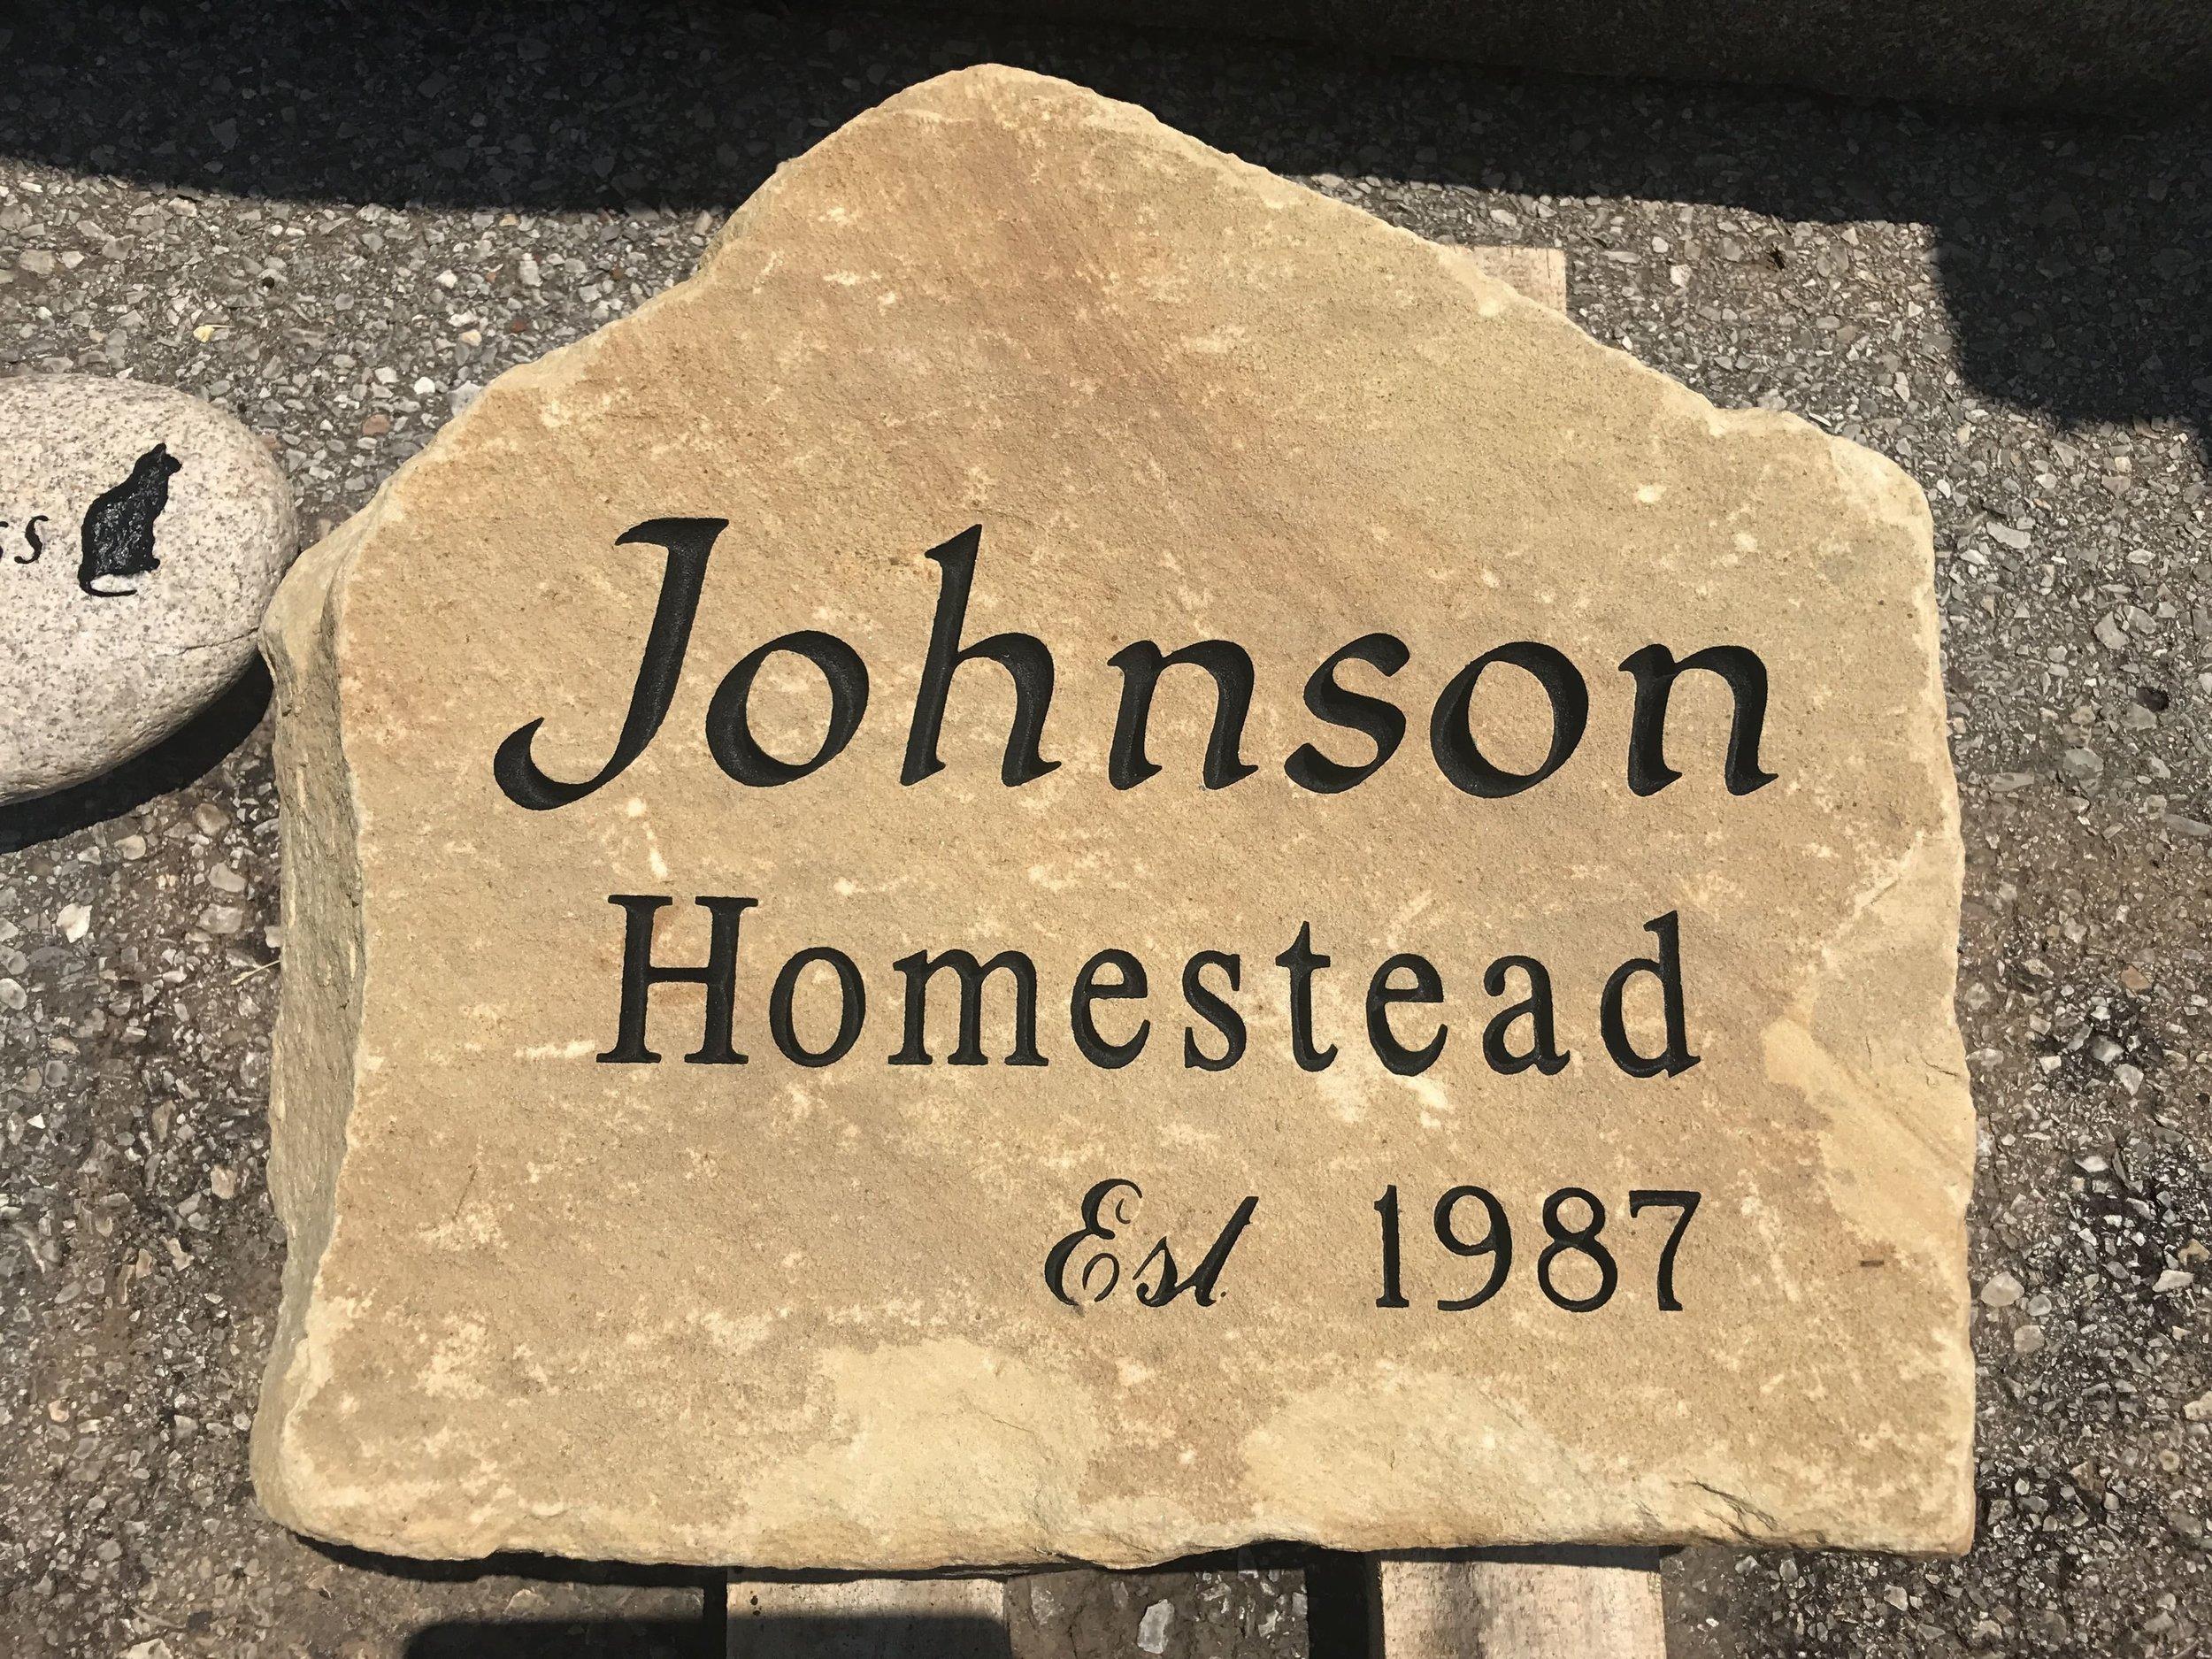 Homestead Engraved - Limestone Sign.jpg